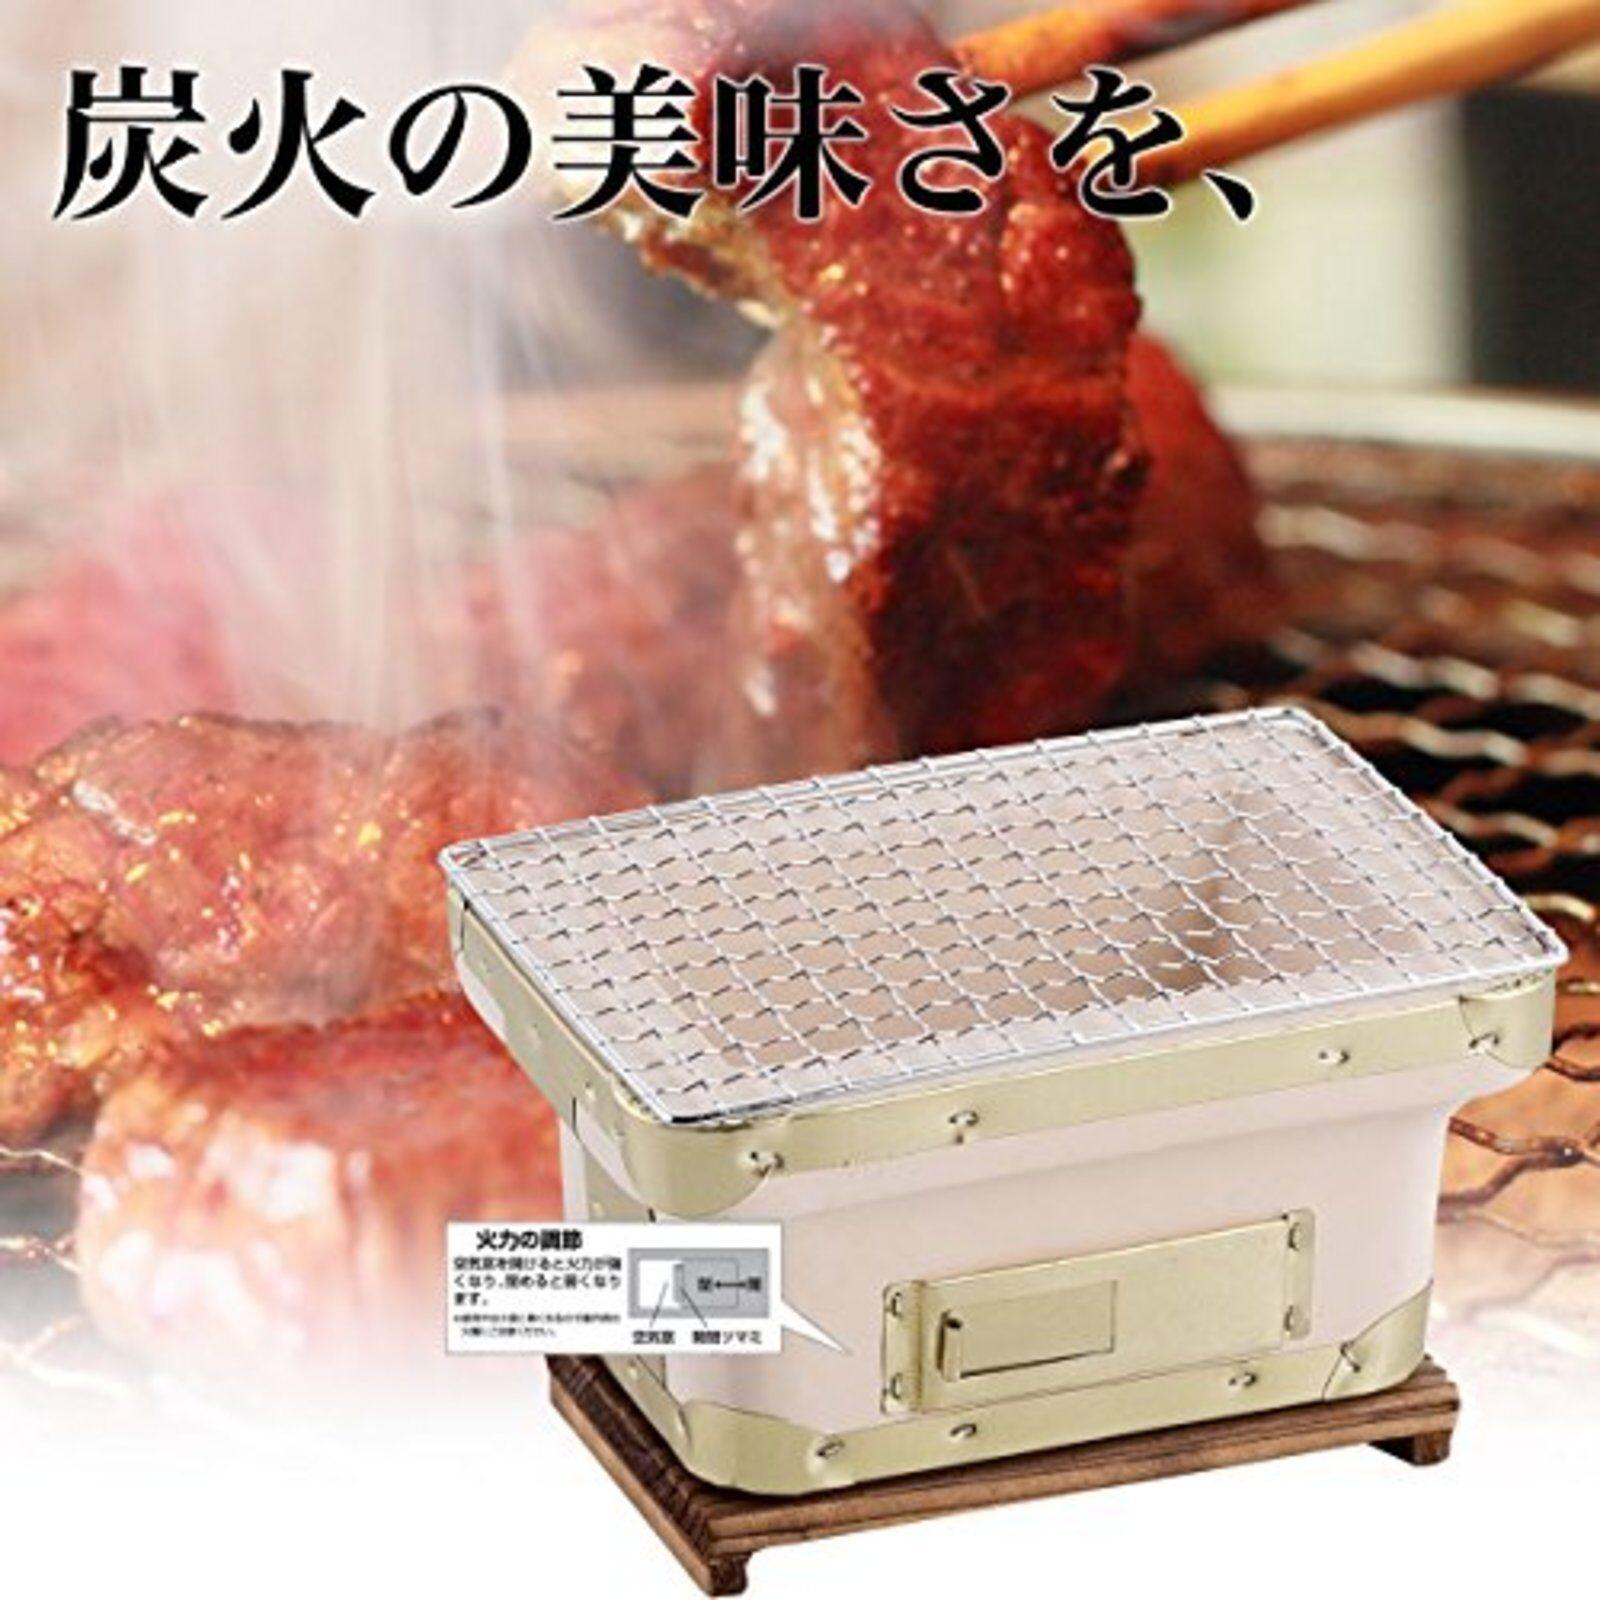 Bundok Diatomite Holzkohlegrill Bd-384 Grill-Bbq Japan Import